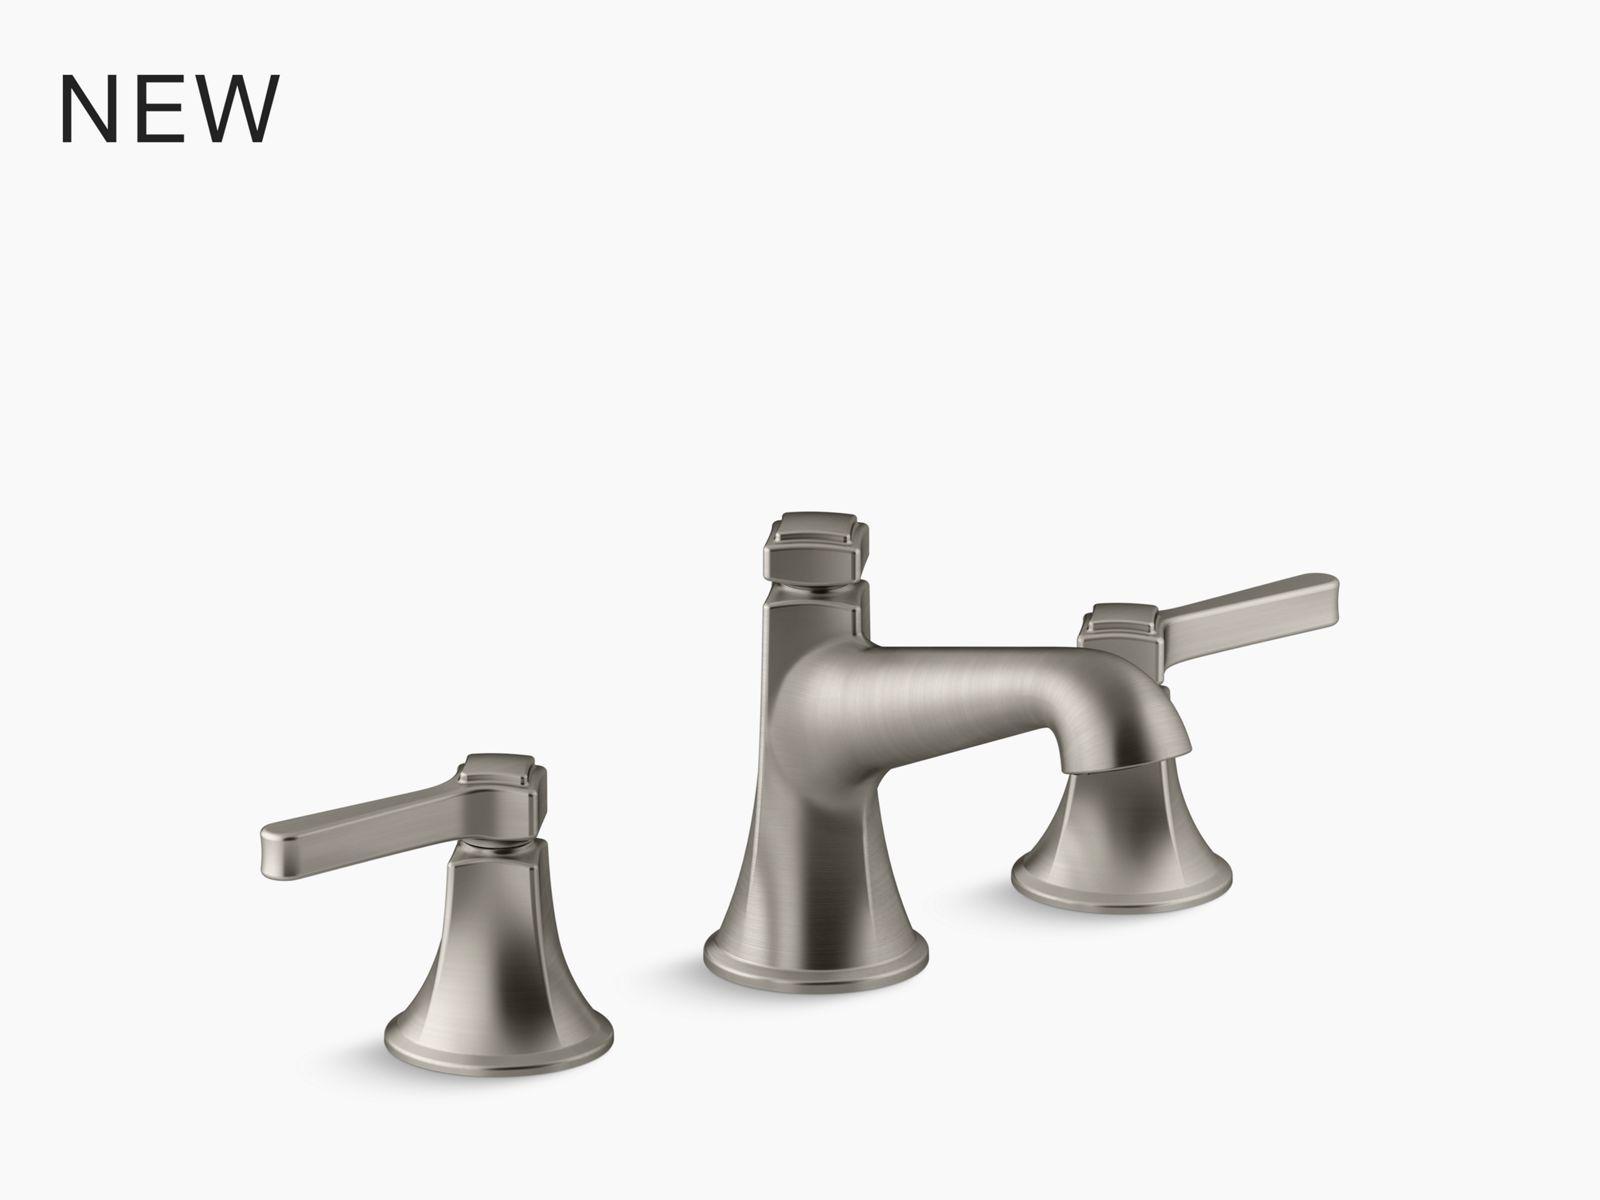 venza centerset bathroom sink faucet with lever handles